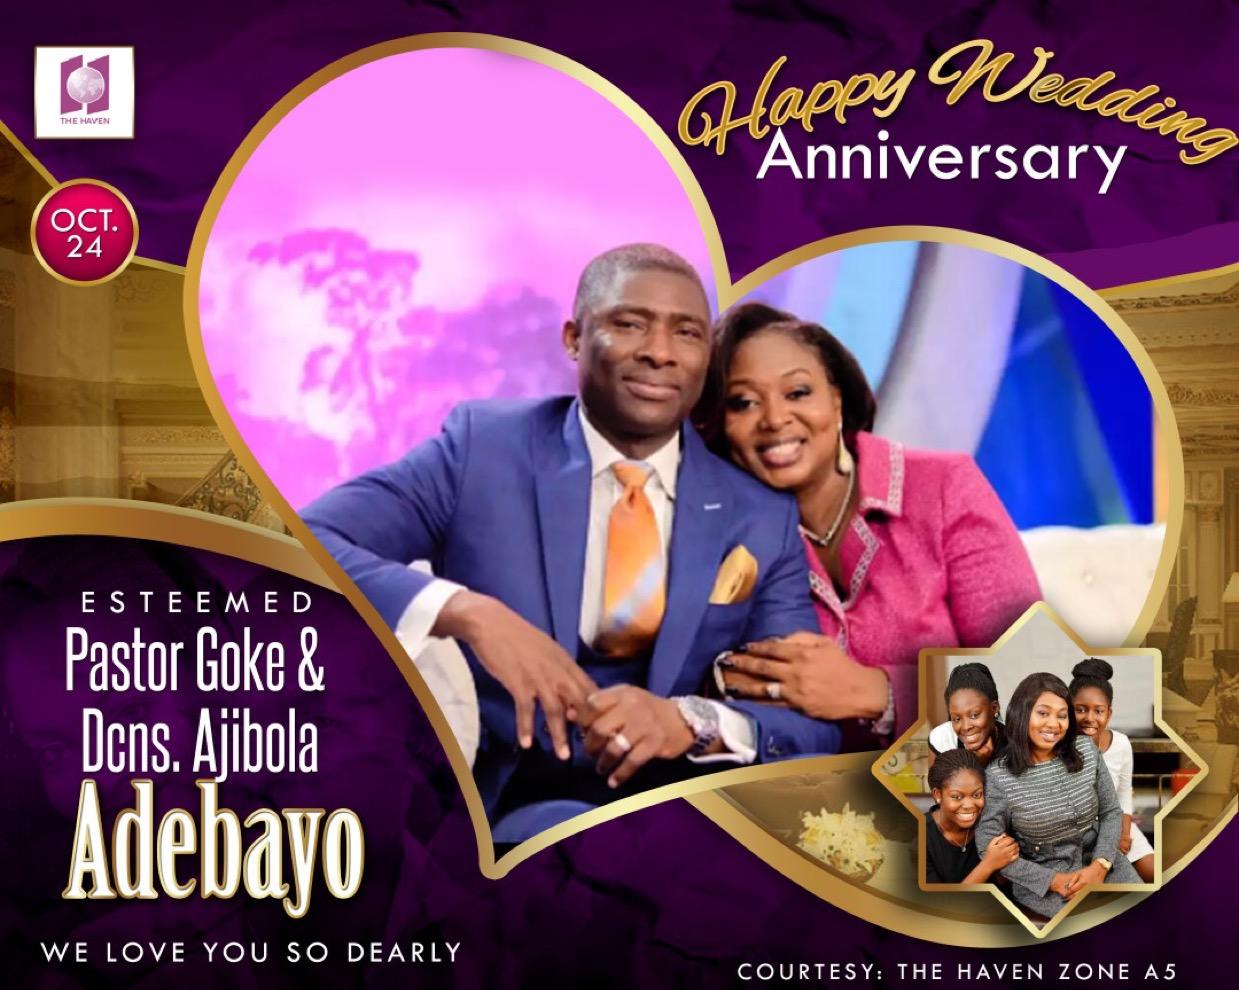 Happy wedding anniversary pastor Goke